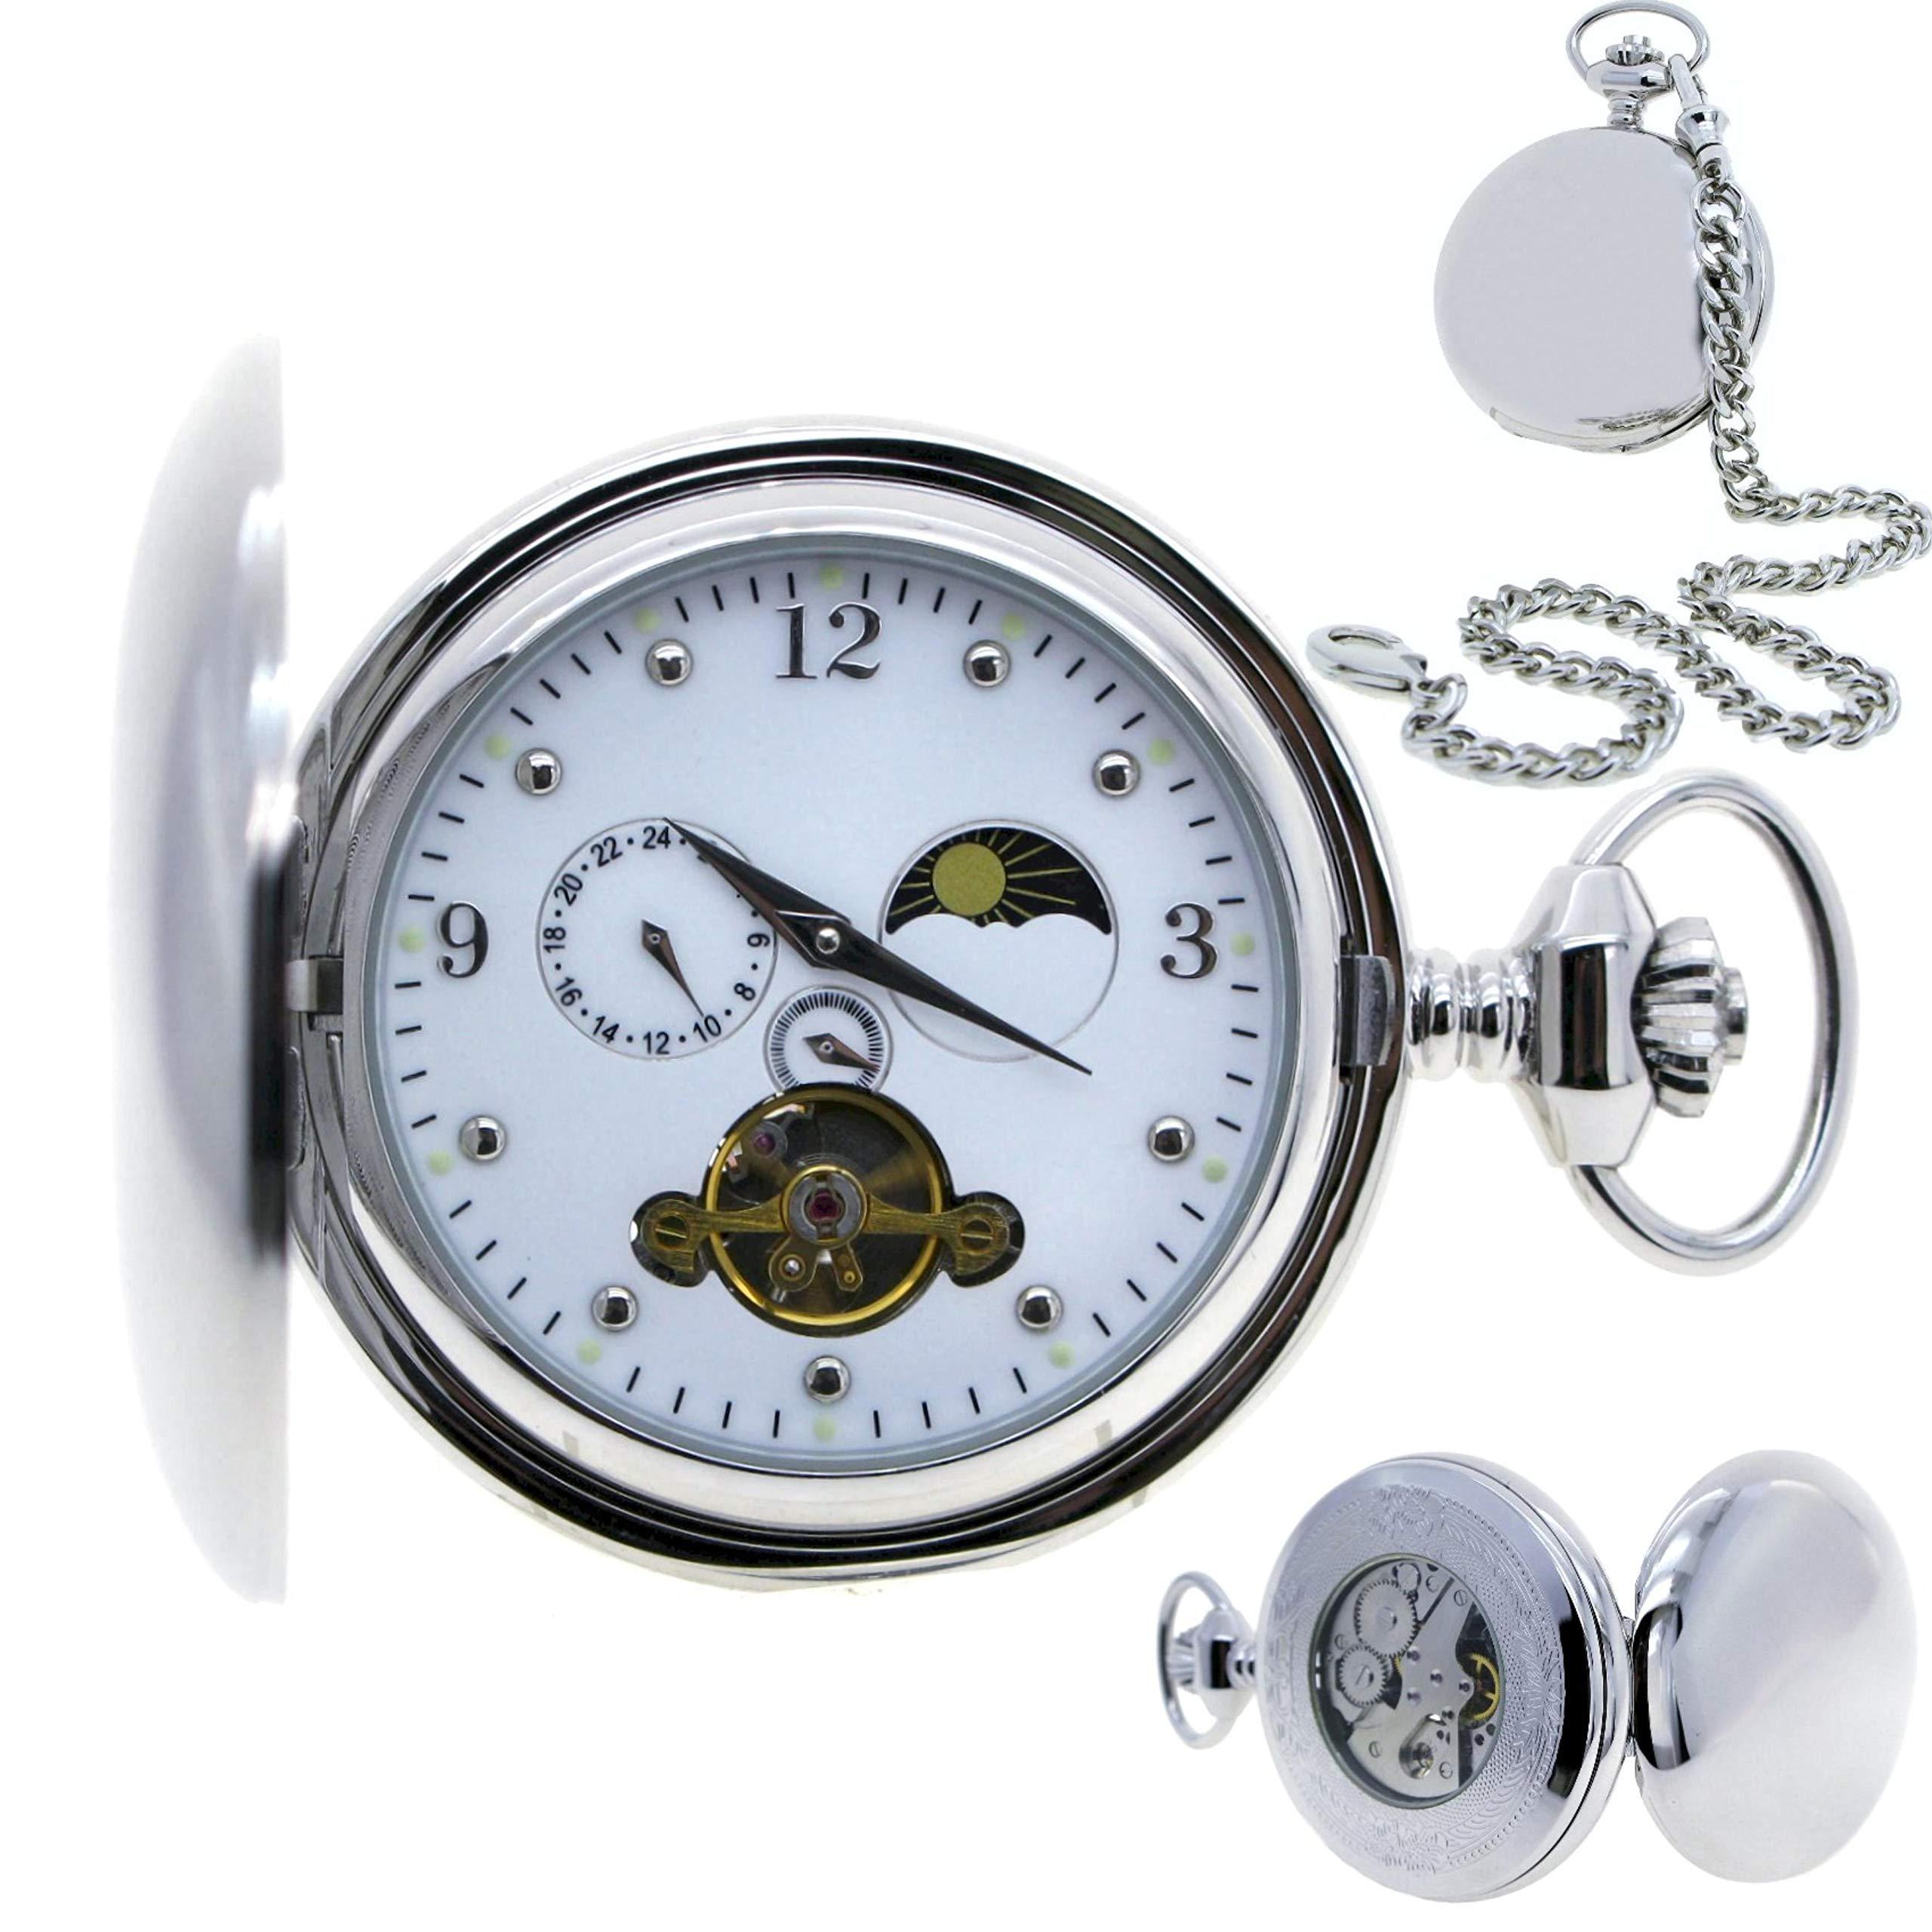 Tourbillon Mechanical Pocket Watch Skeleton Hand-Winding Silver Polish Sun & Moon Small Second 24 Hours White Enamel Dial P42B by watchvshop